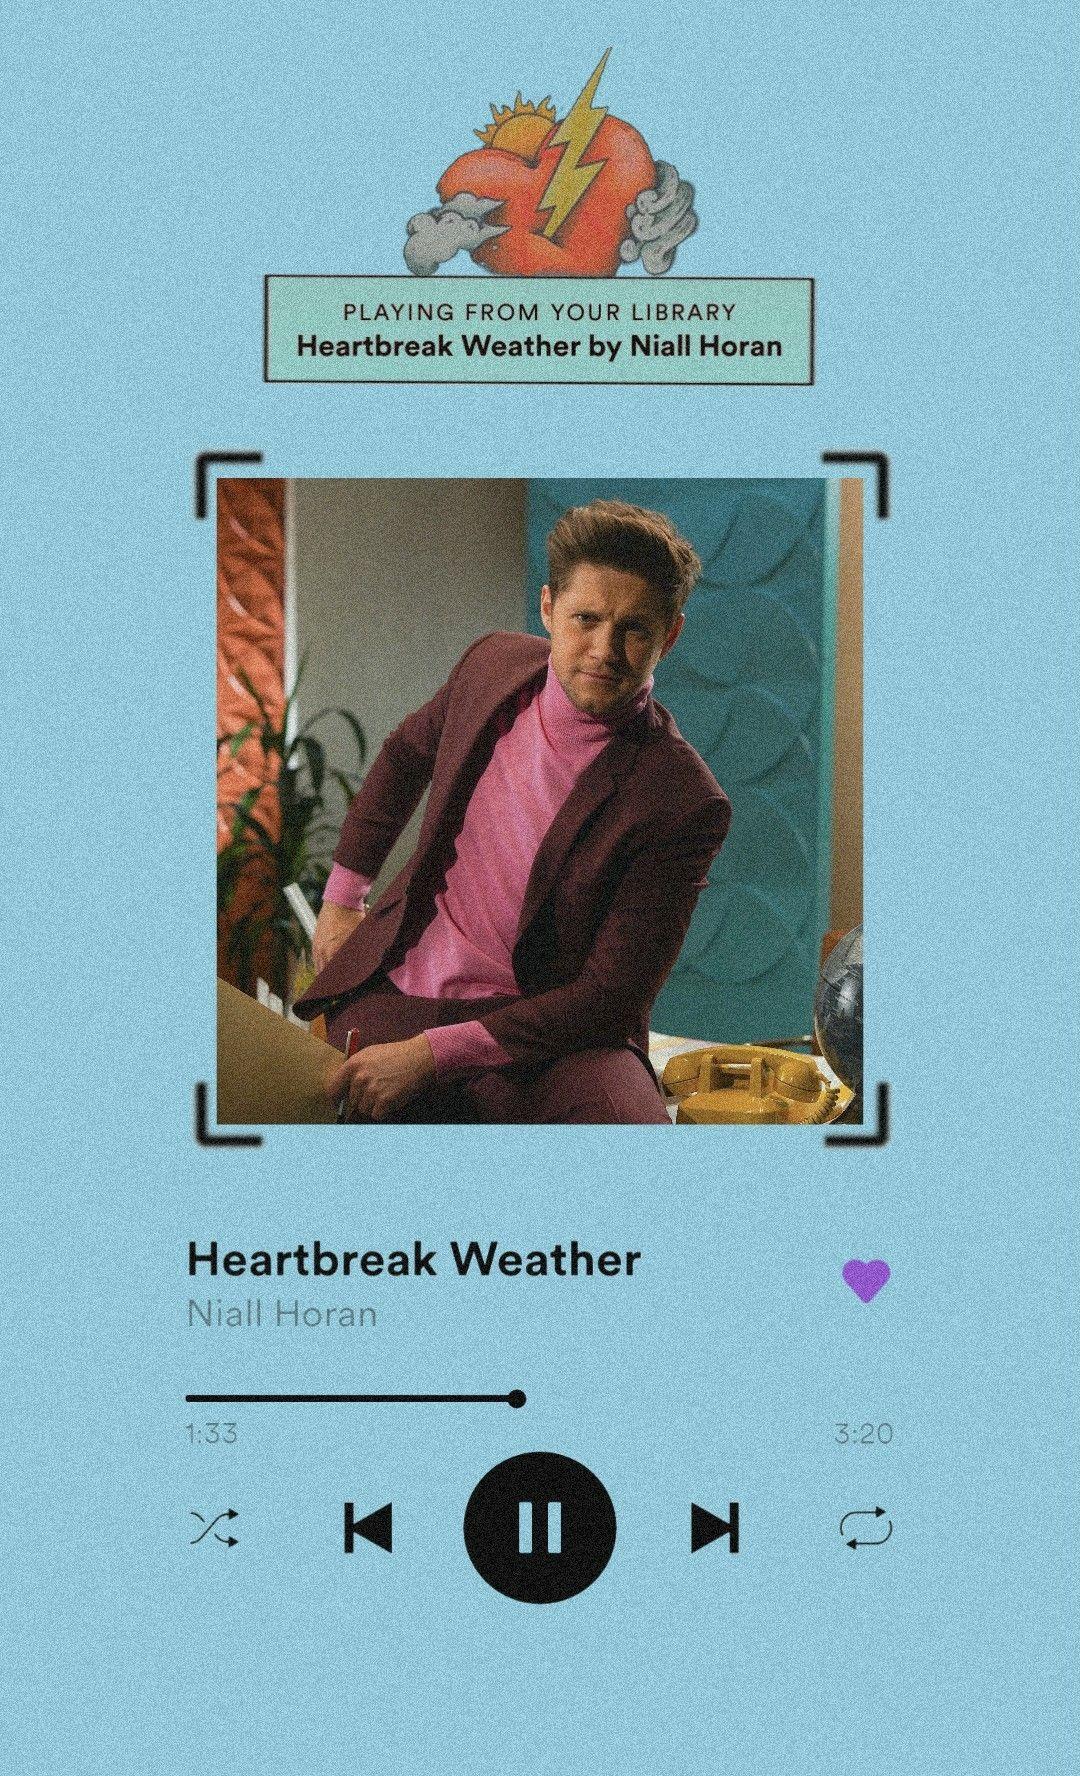 Niall Horan Heartbreak Weather Player Lockscreen In 2020 Niall Horan Lyrics Song Lyrics Wallpaper One Direction Songs